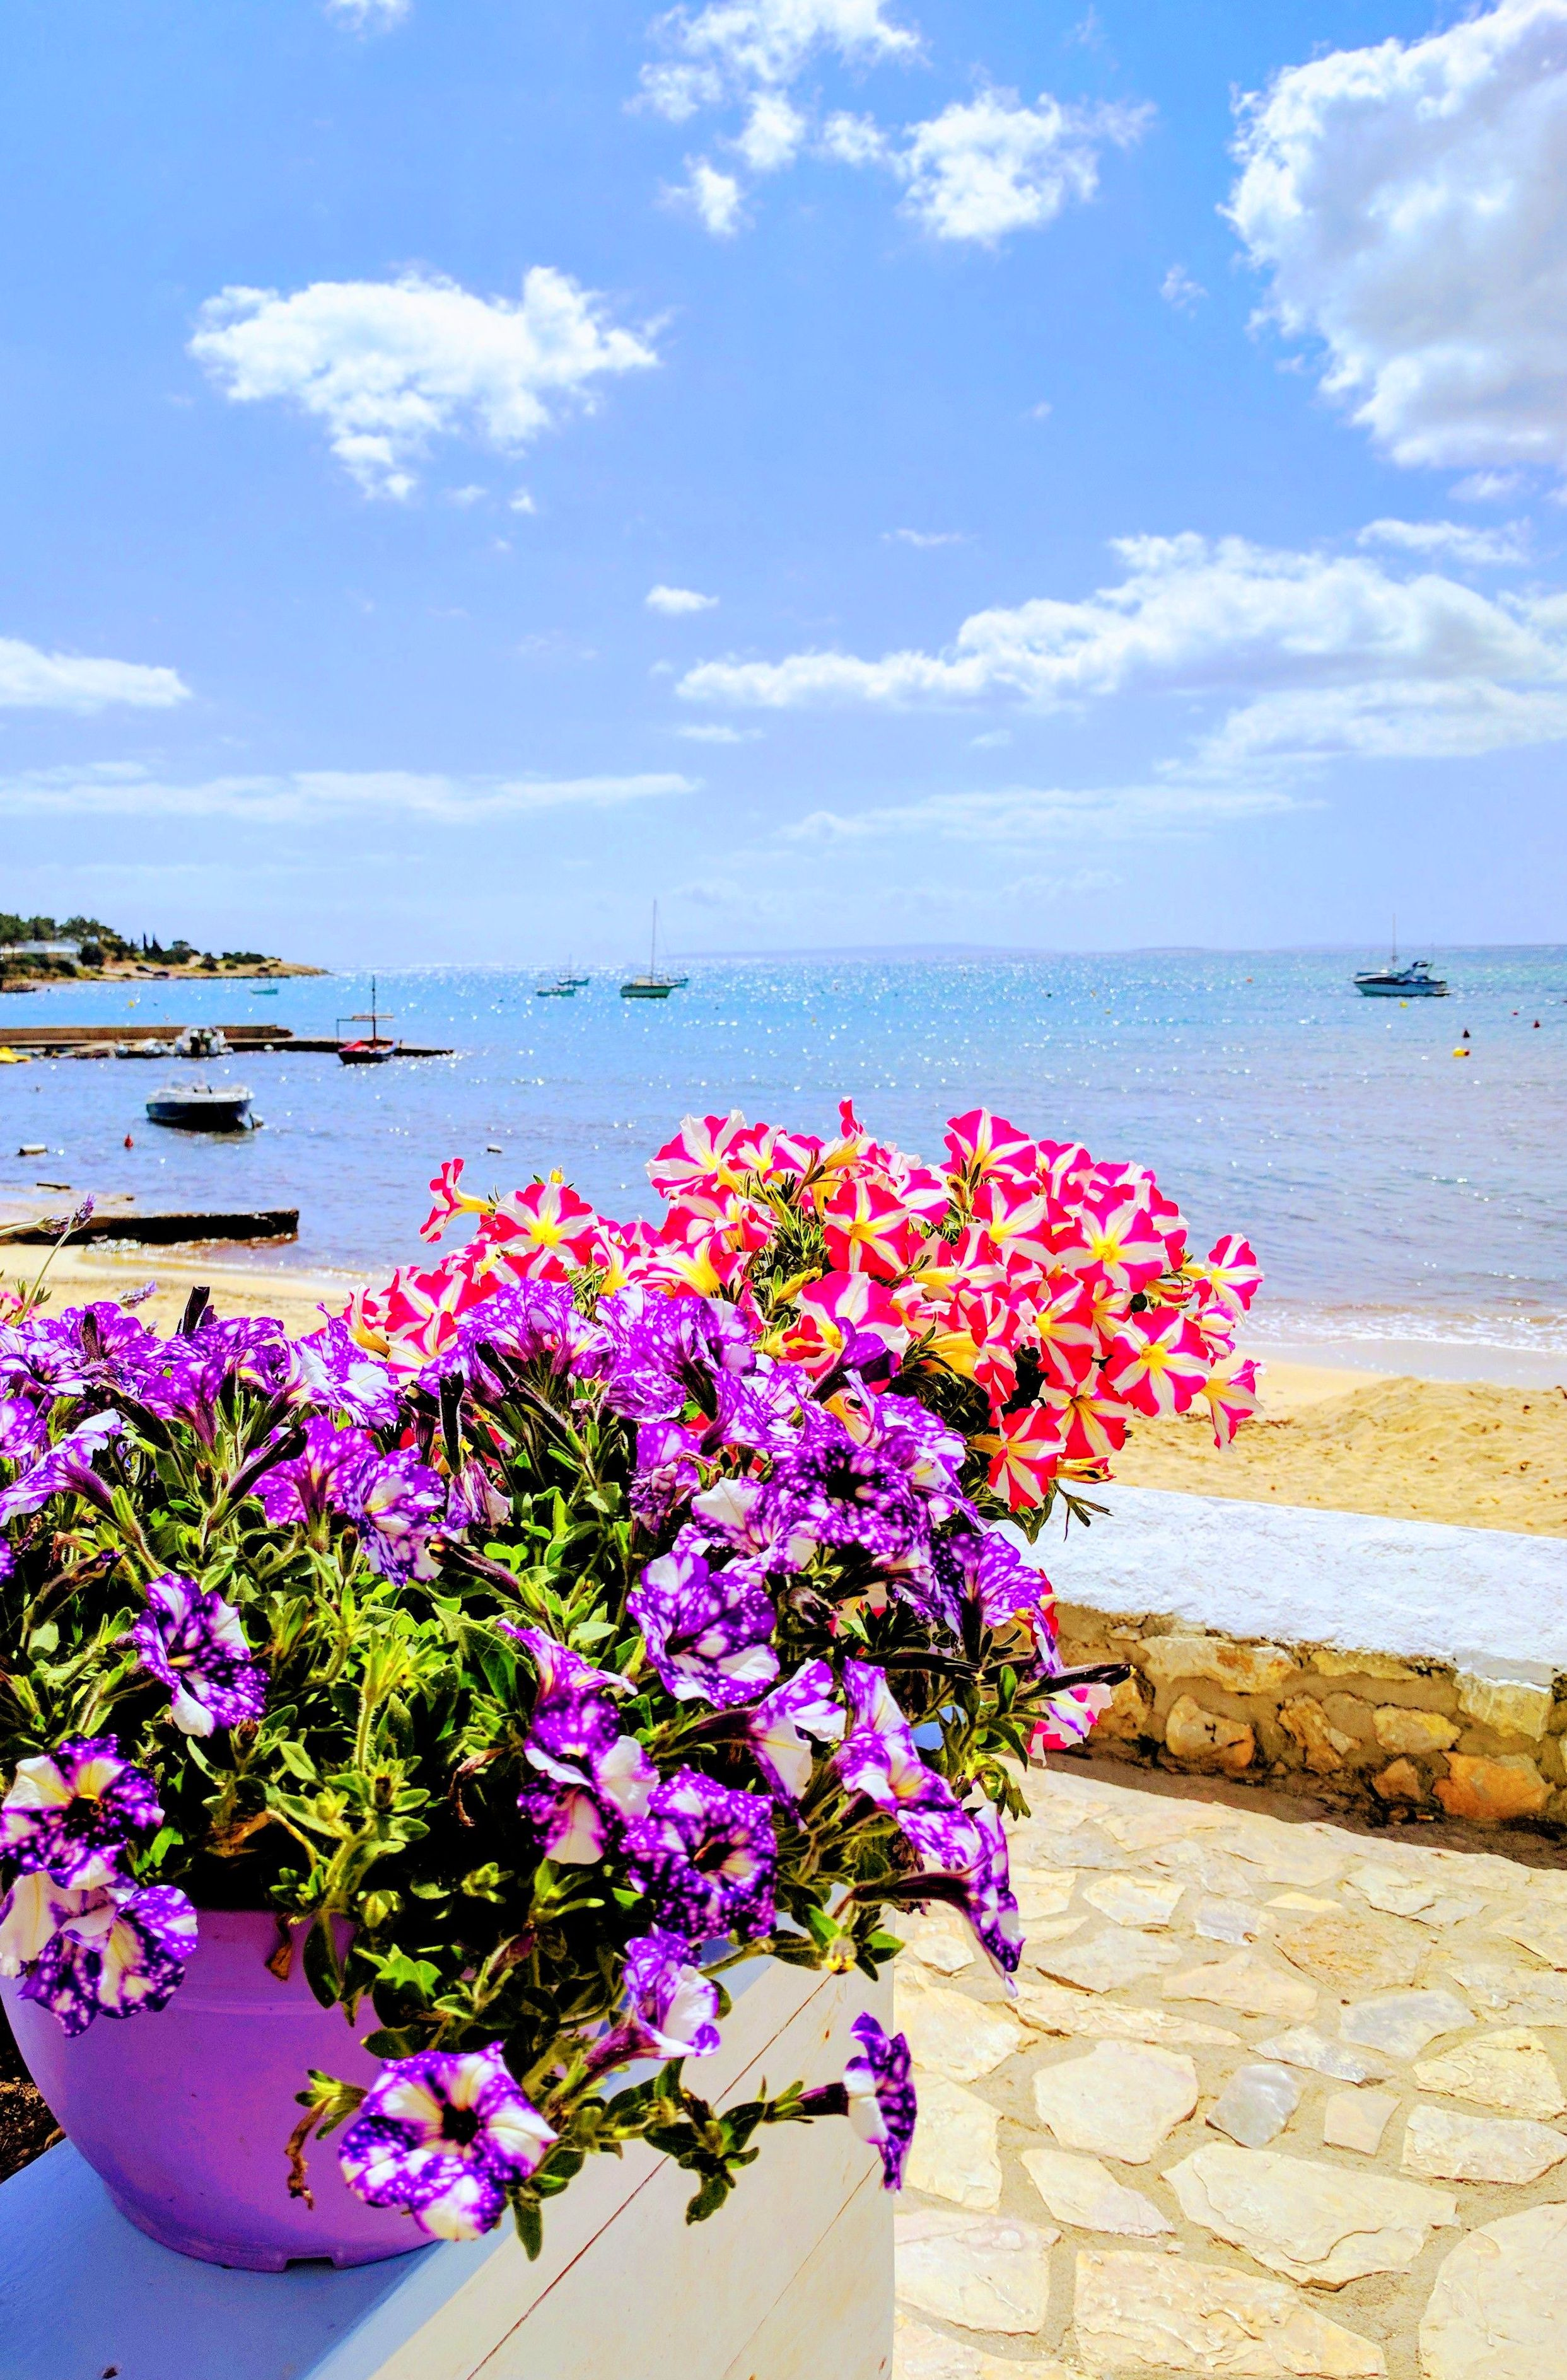 Foto 3 de Abogados en Eivissa   Raad Abogados. Tel 691 270 993